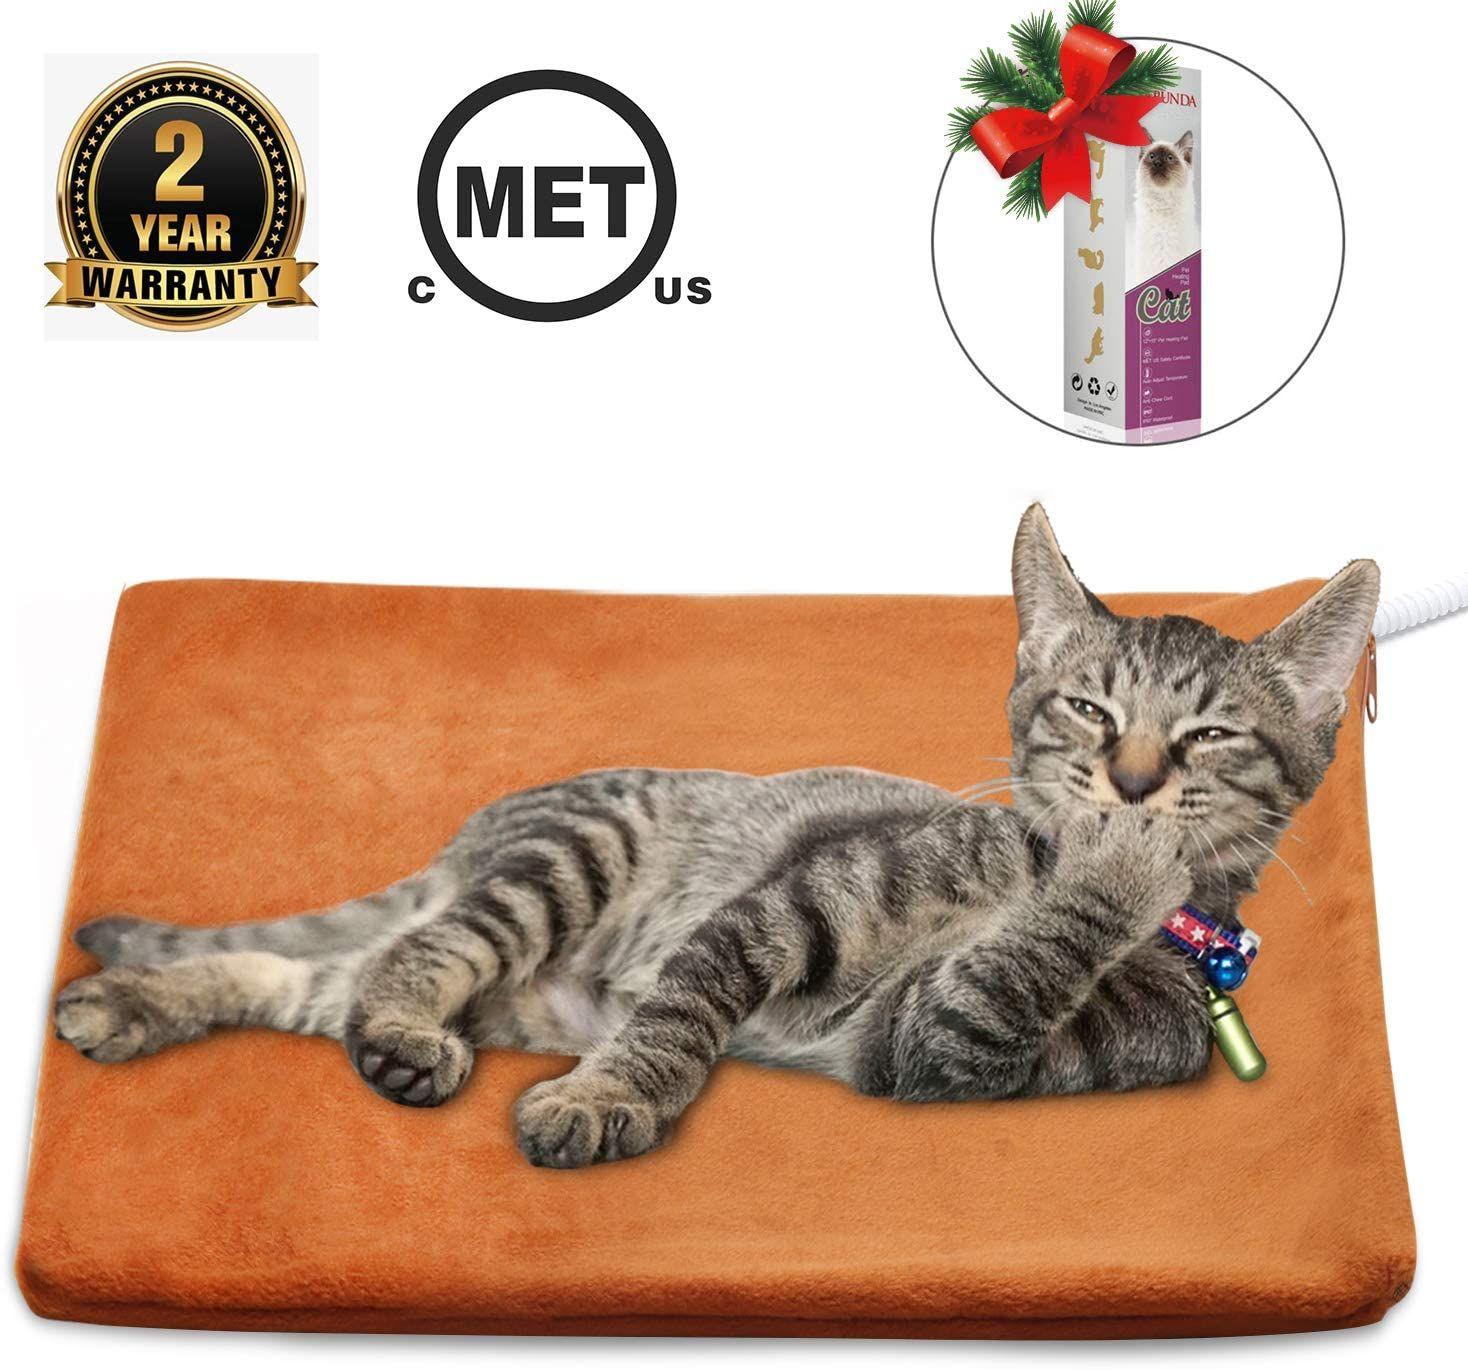 Marunda Pet Heating Pad Cat Dog Electric Pet Heating Pad Indoor Waterproof Auto Constant Tempera Pet Heating Pad Pets Cats